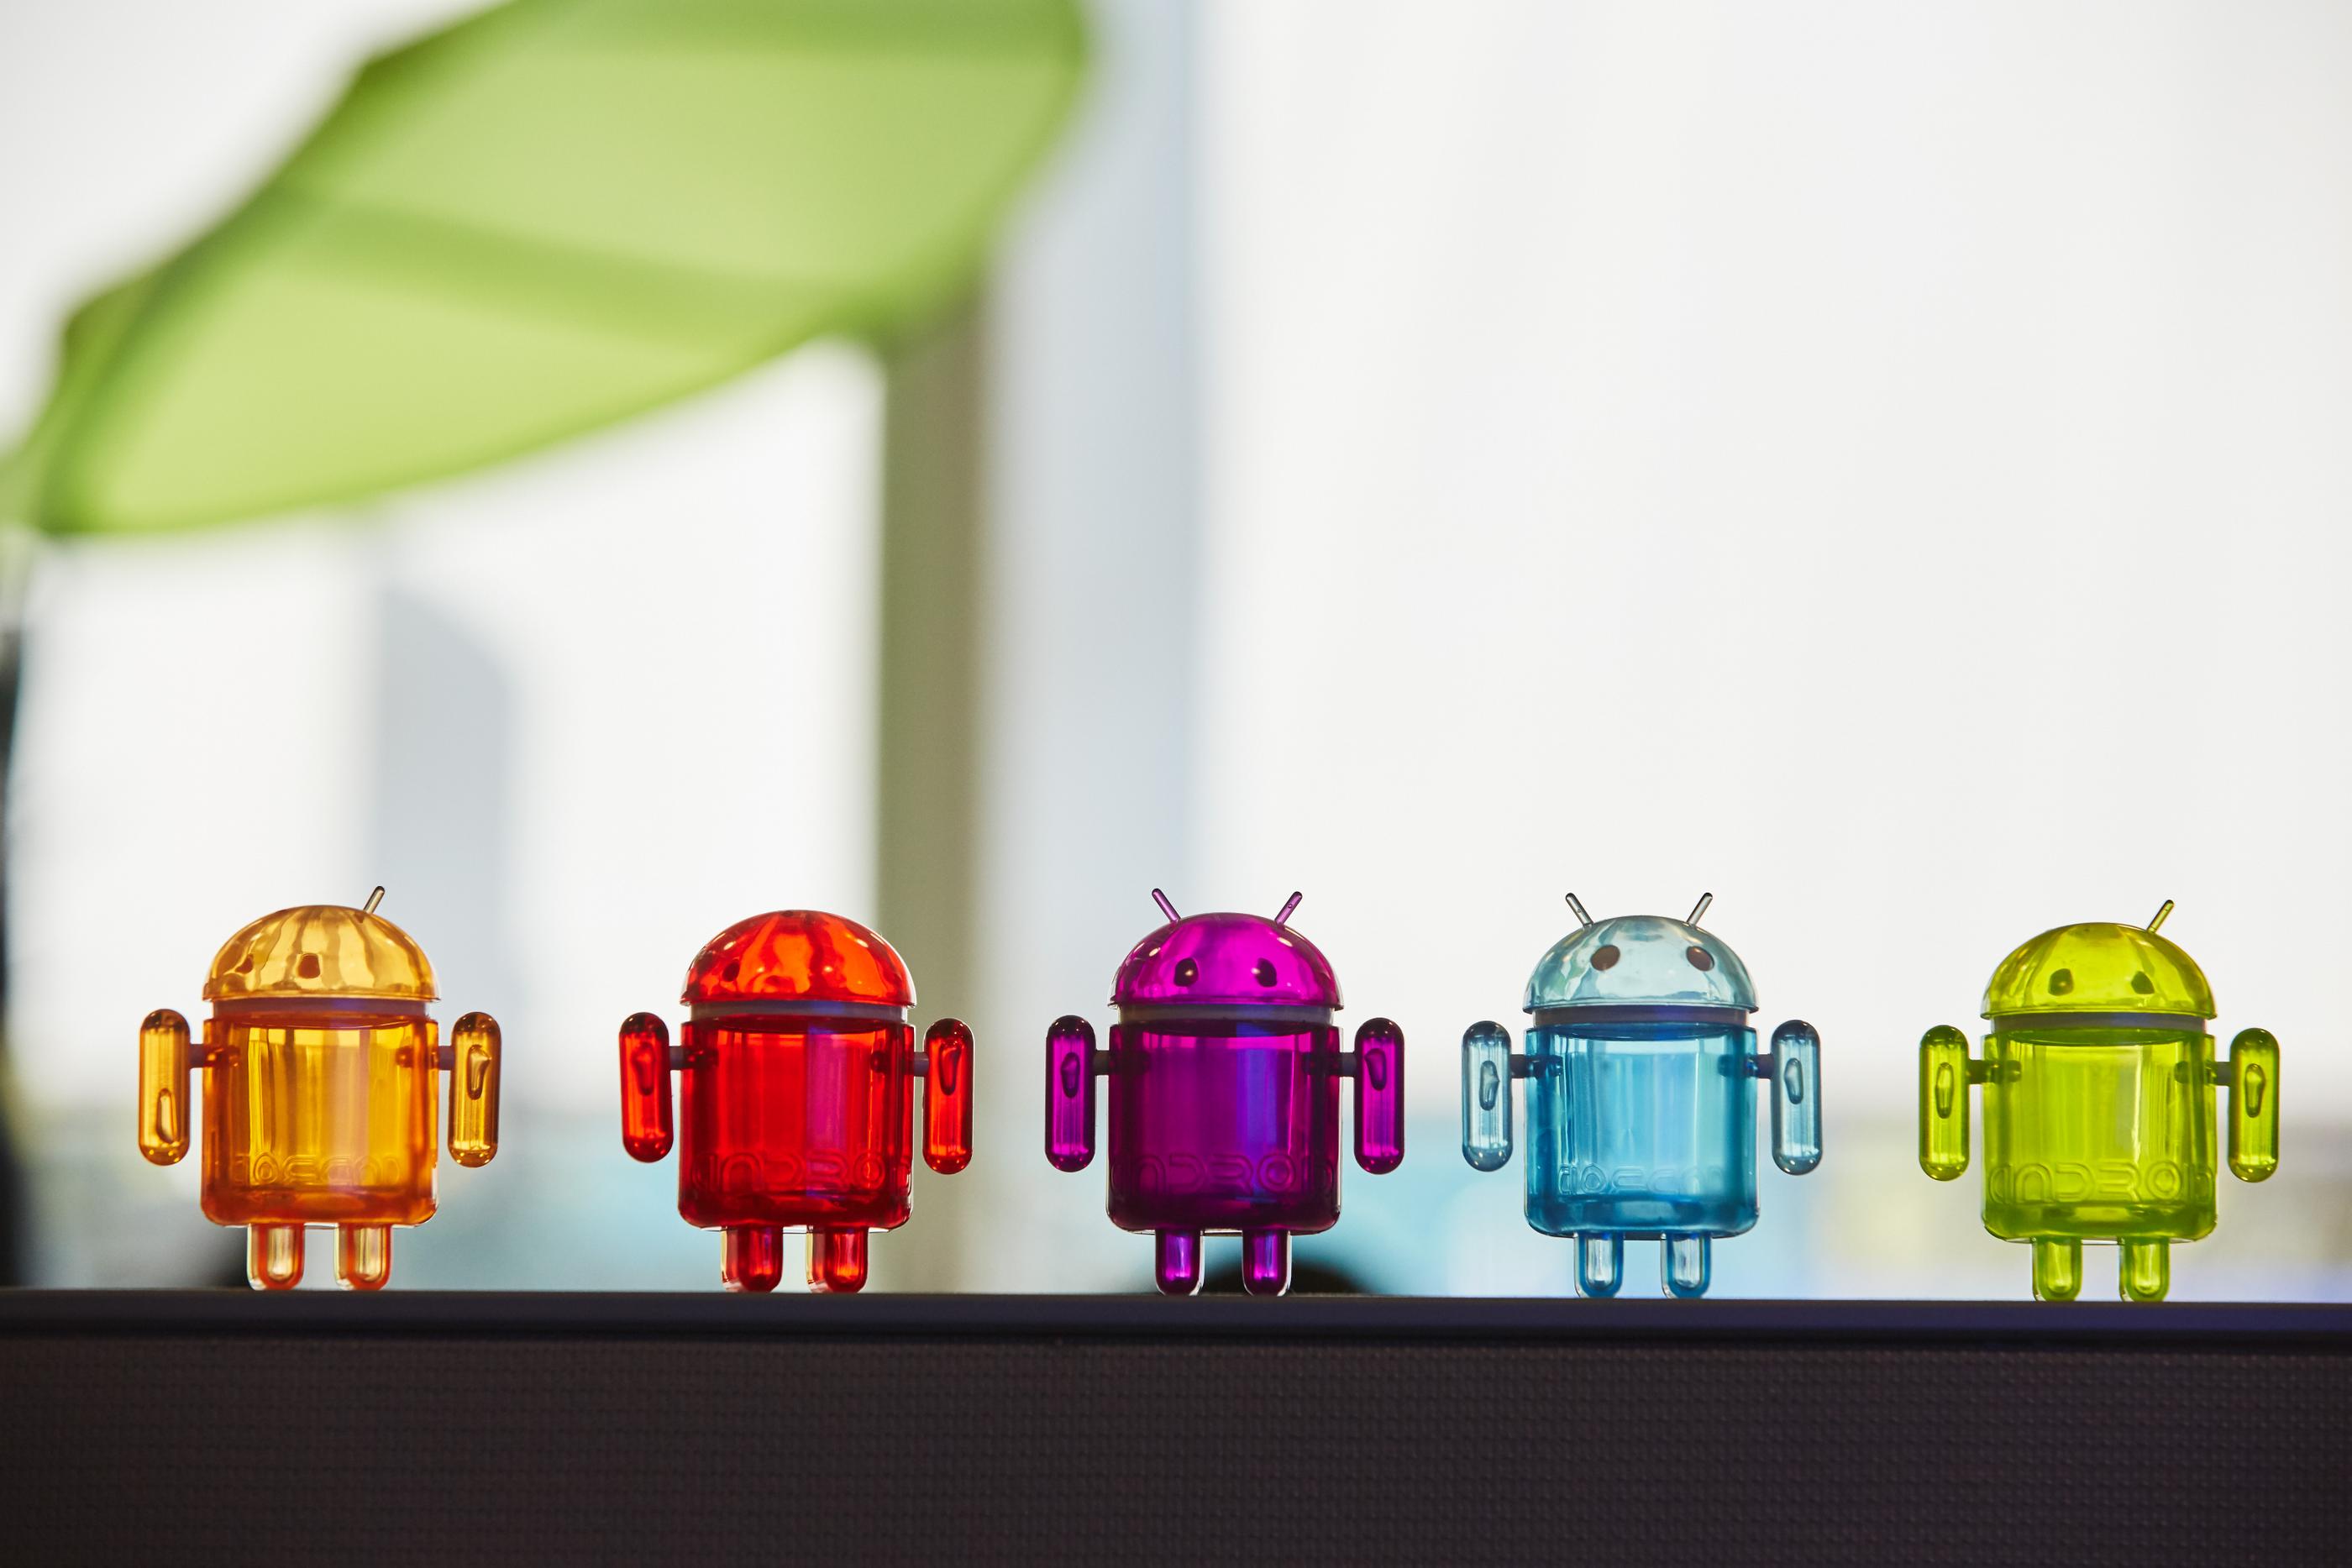 Google Android figurines